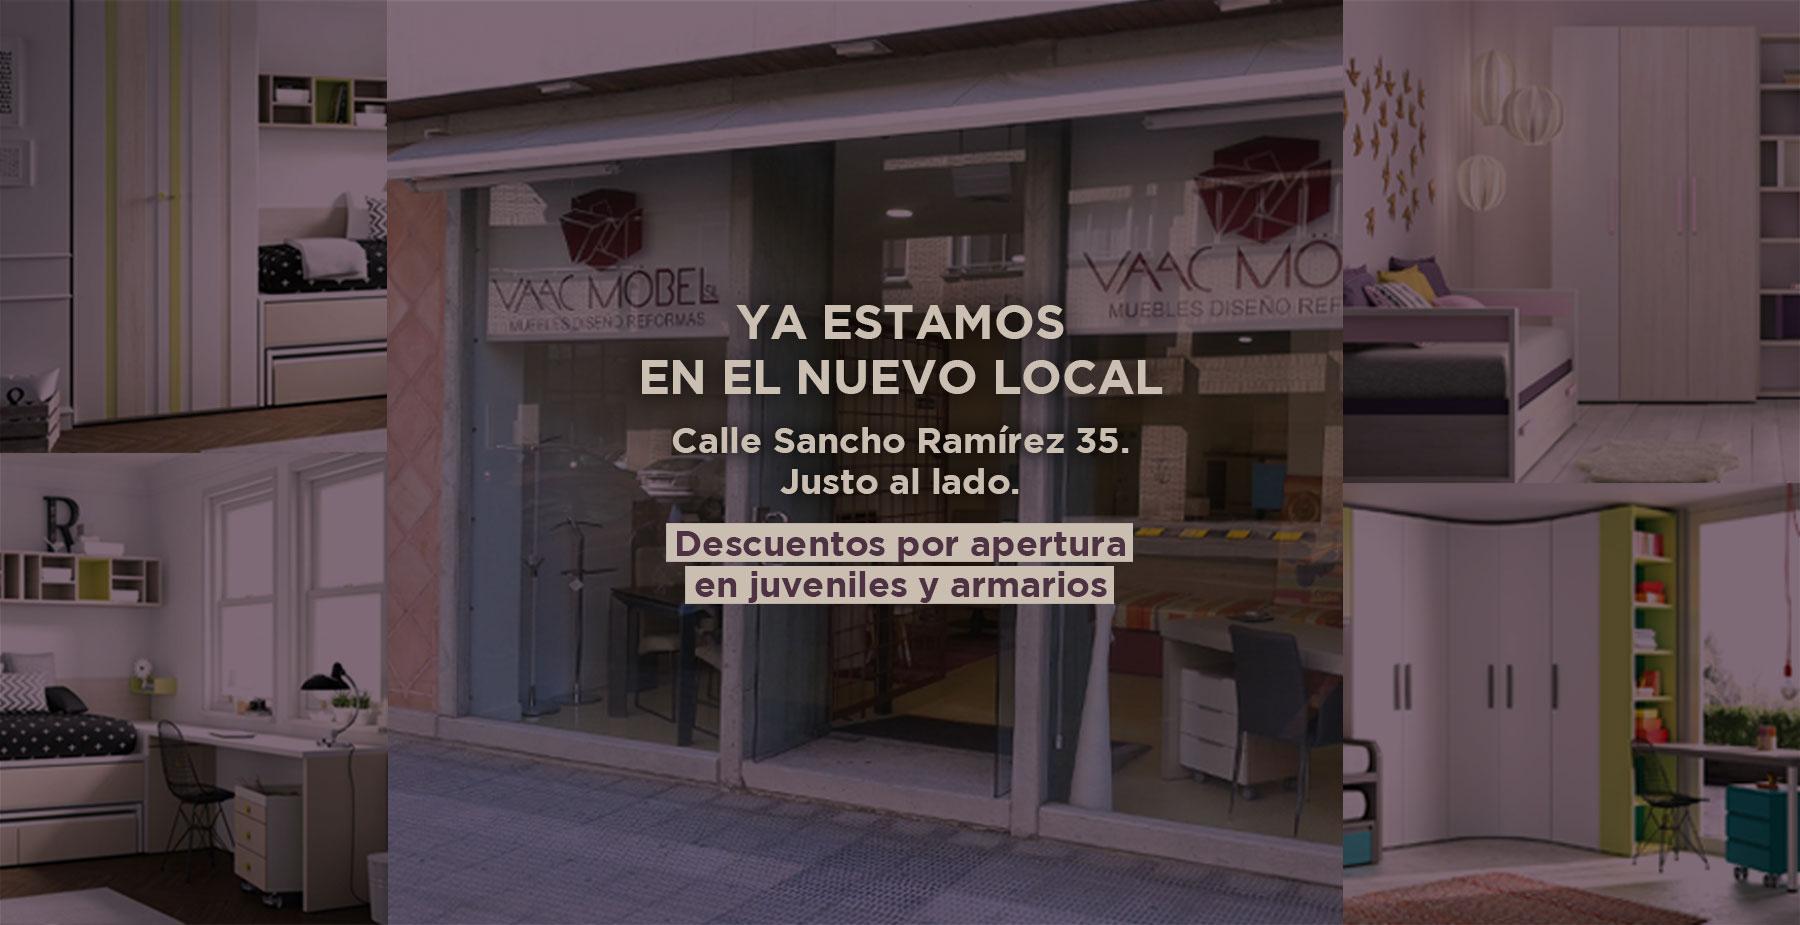 Vaac Mobel Tienda decoración muebles Pamplona